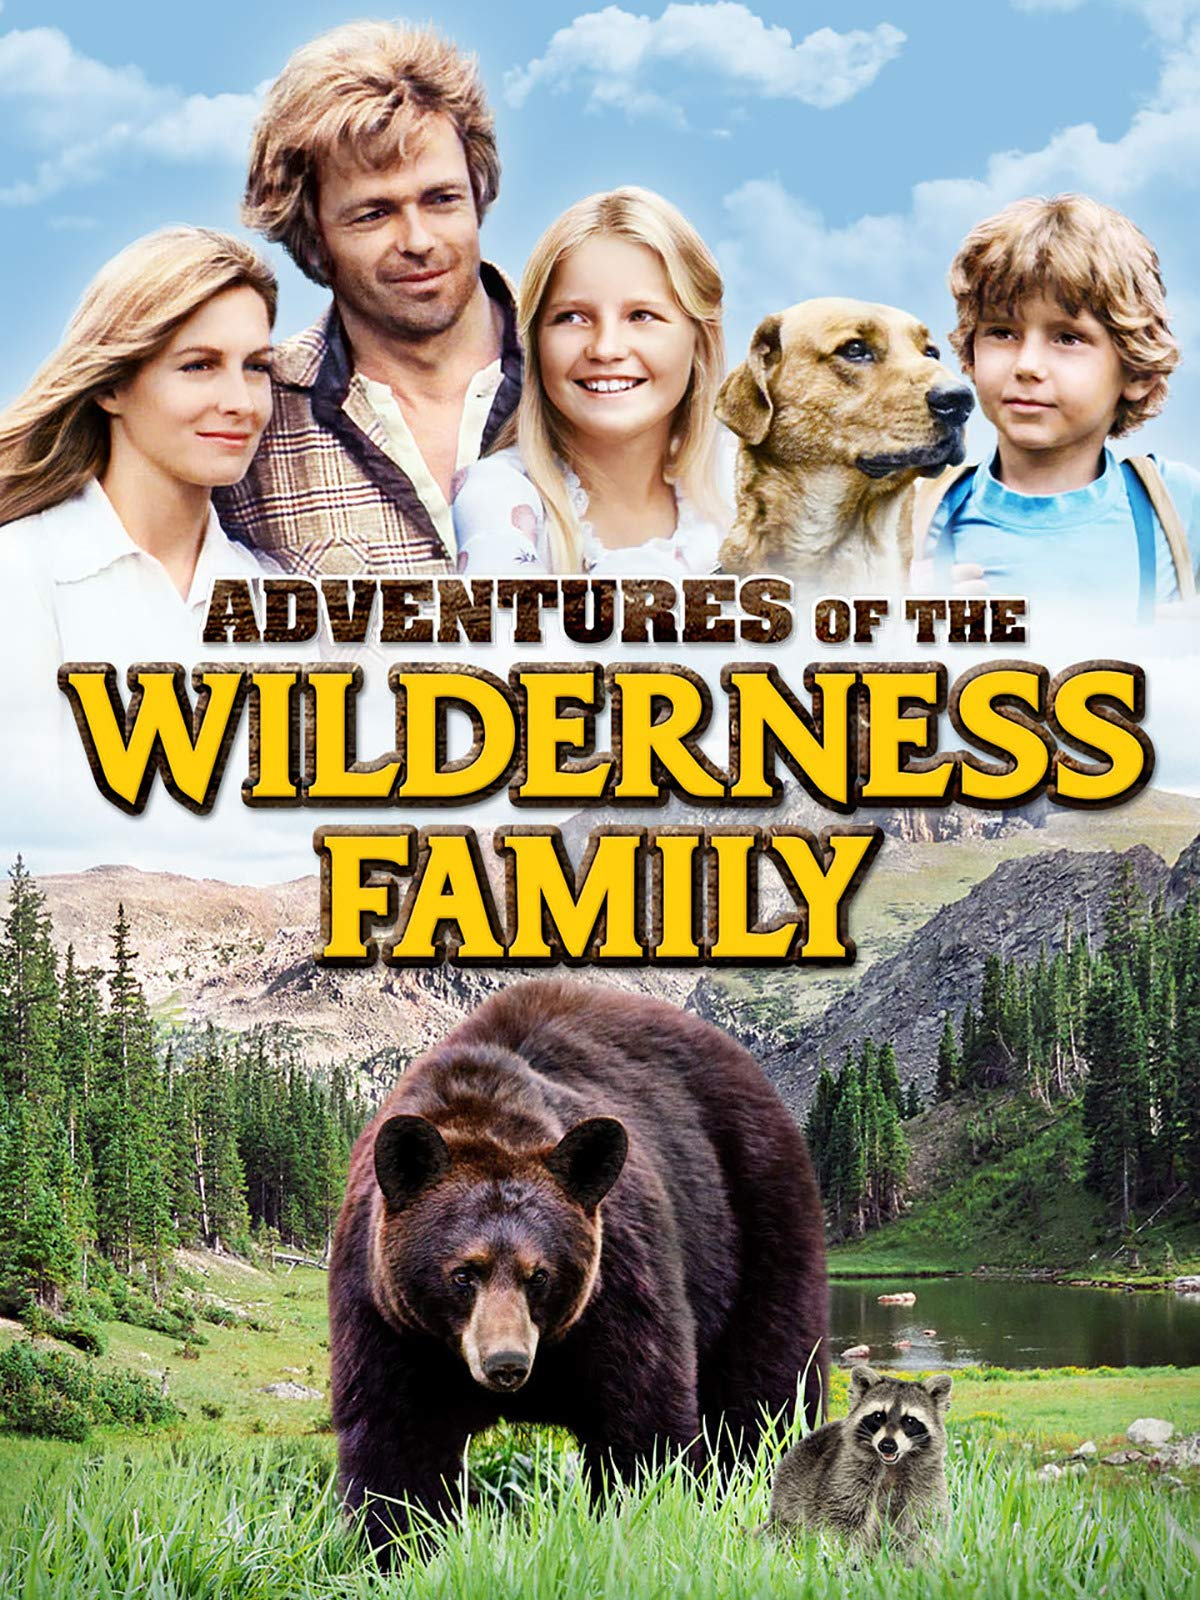 Adventures of the Wilderness Family on Amazon Prime Video UK